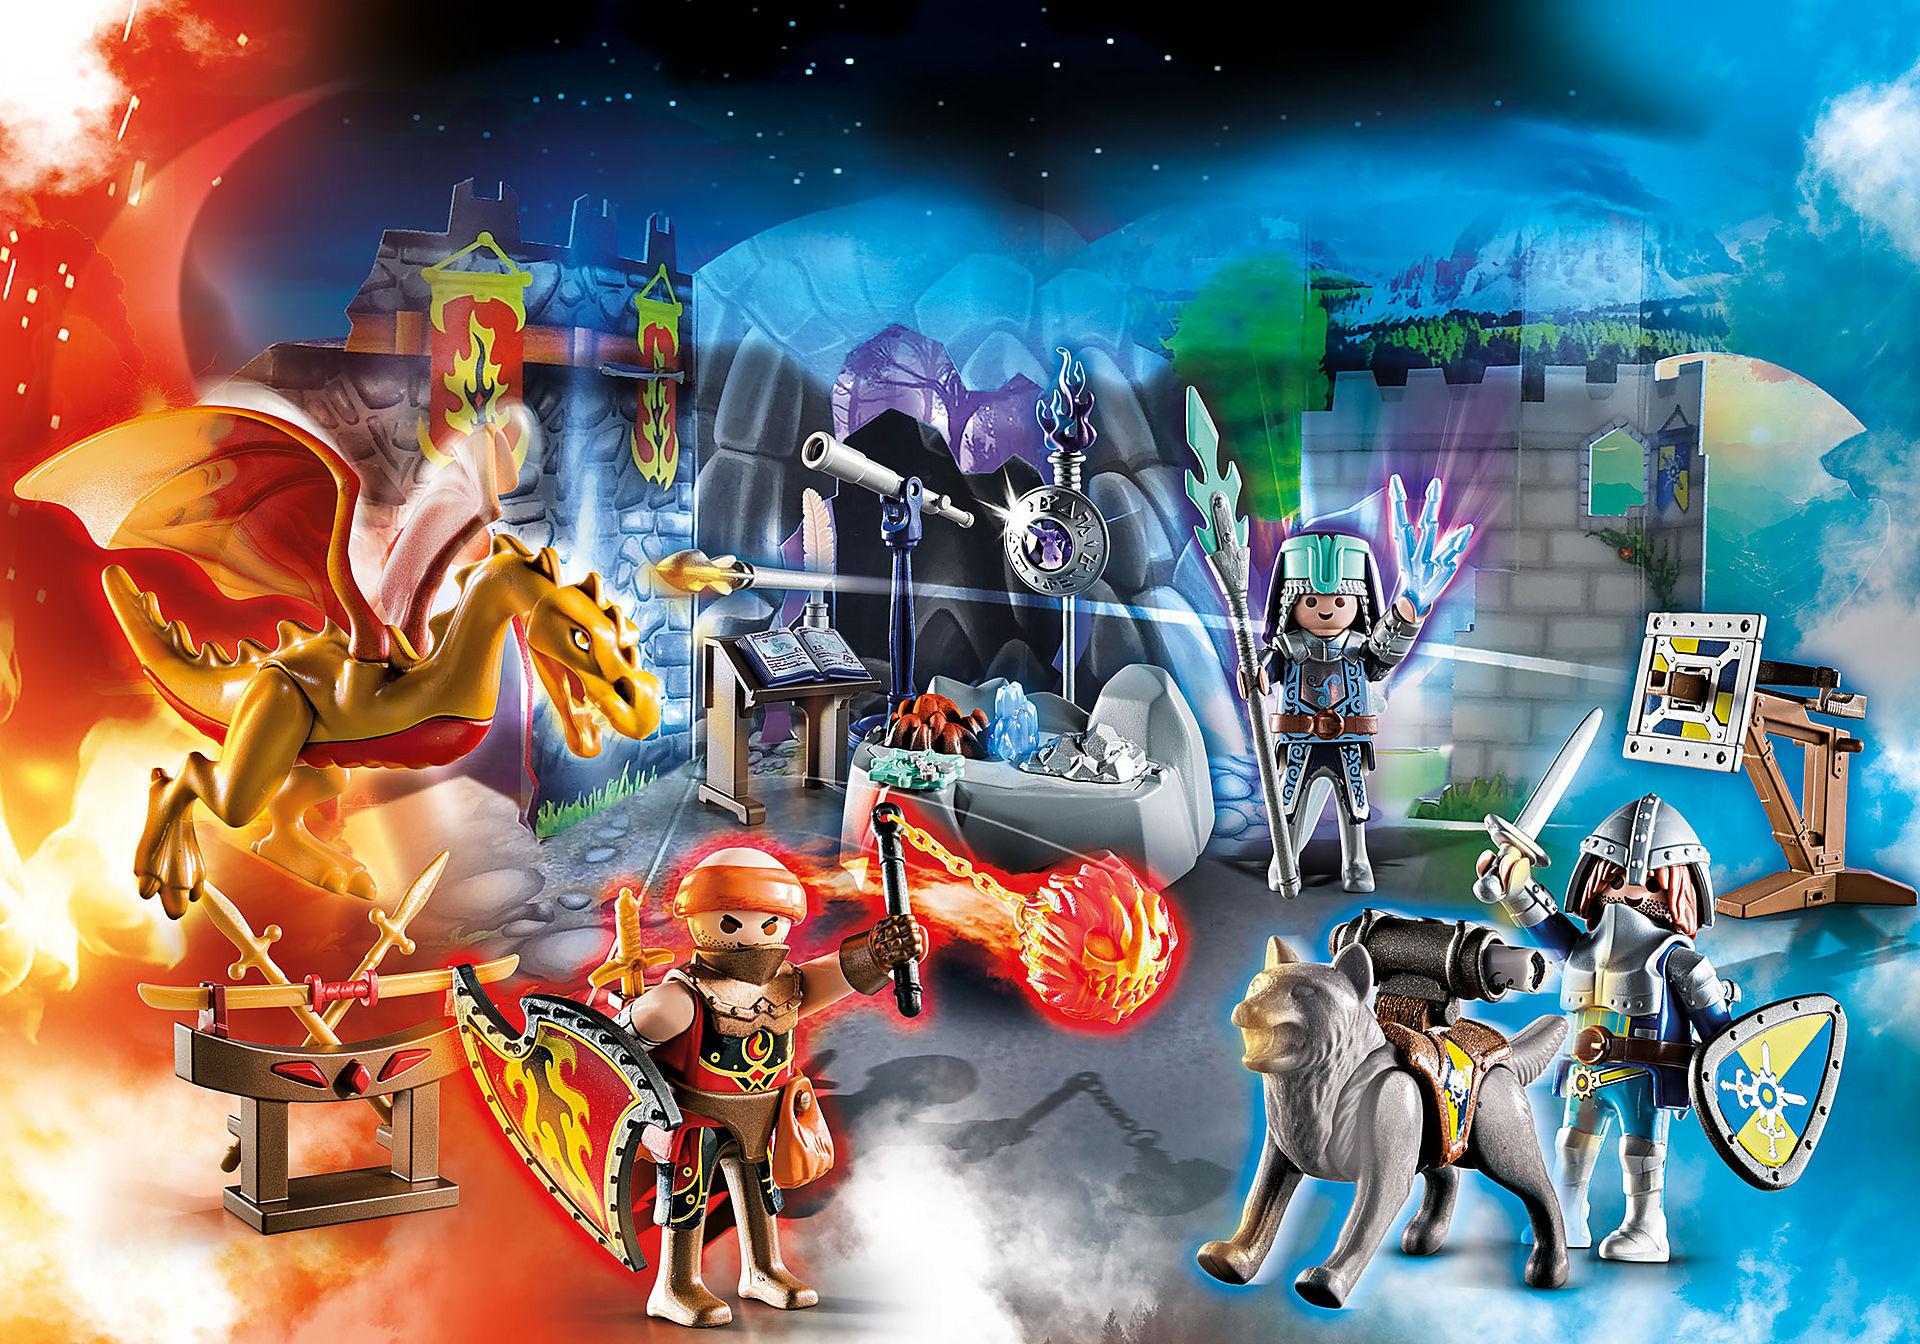 70187 Calendario dell'Avvento - La battaglia dei Cavalieri zoom image3